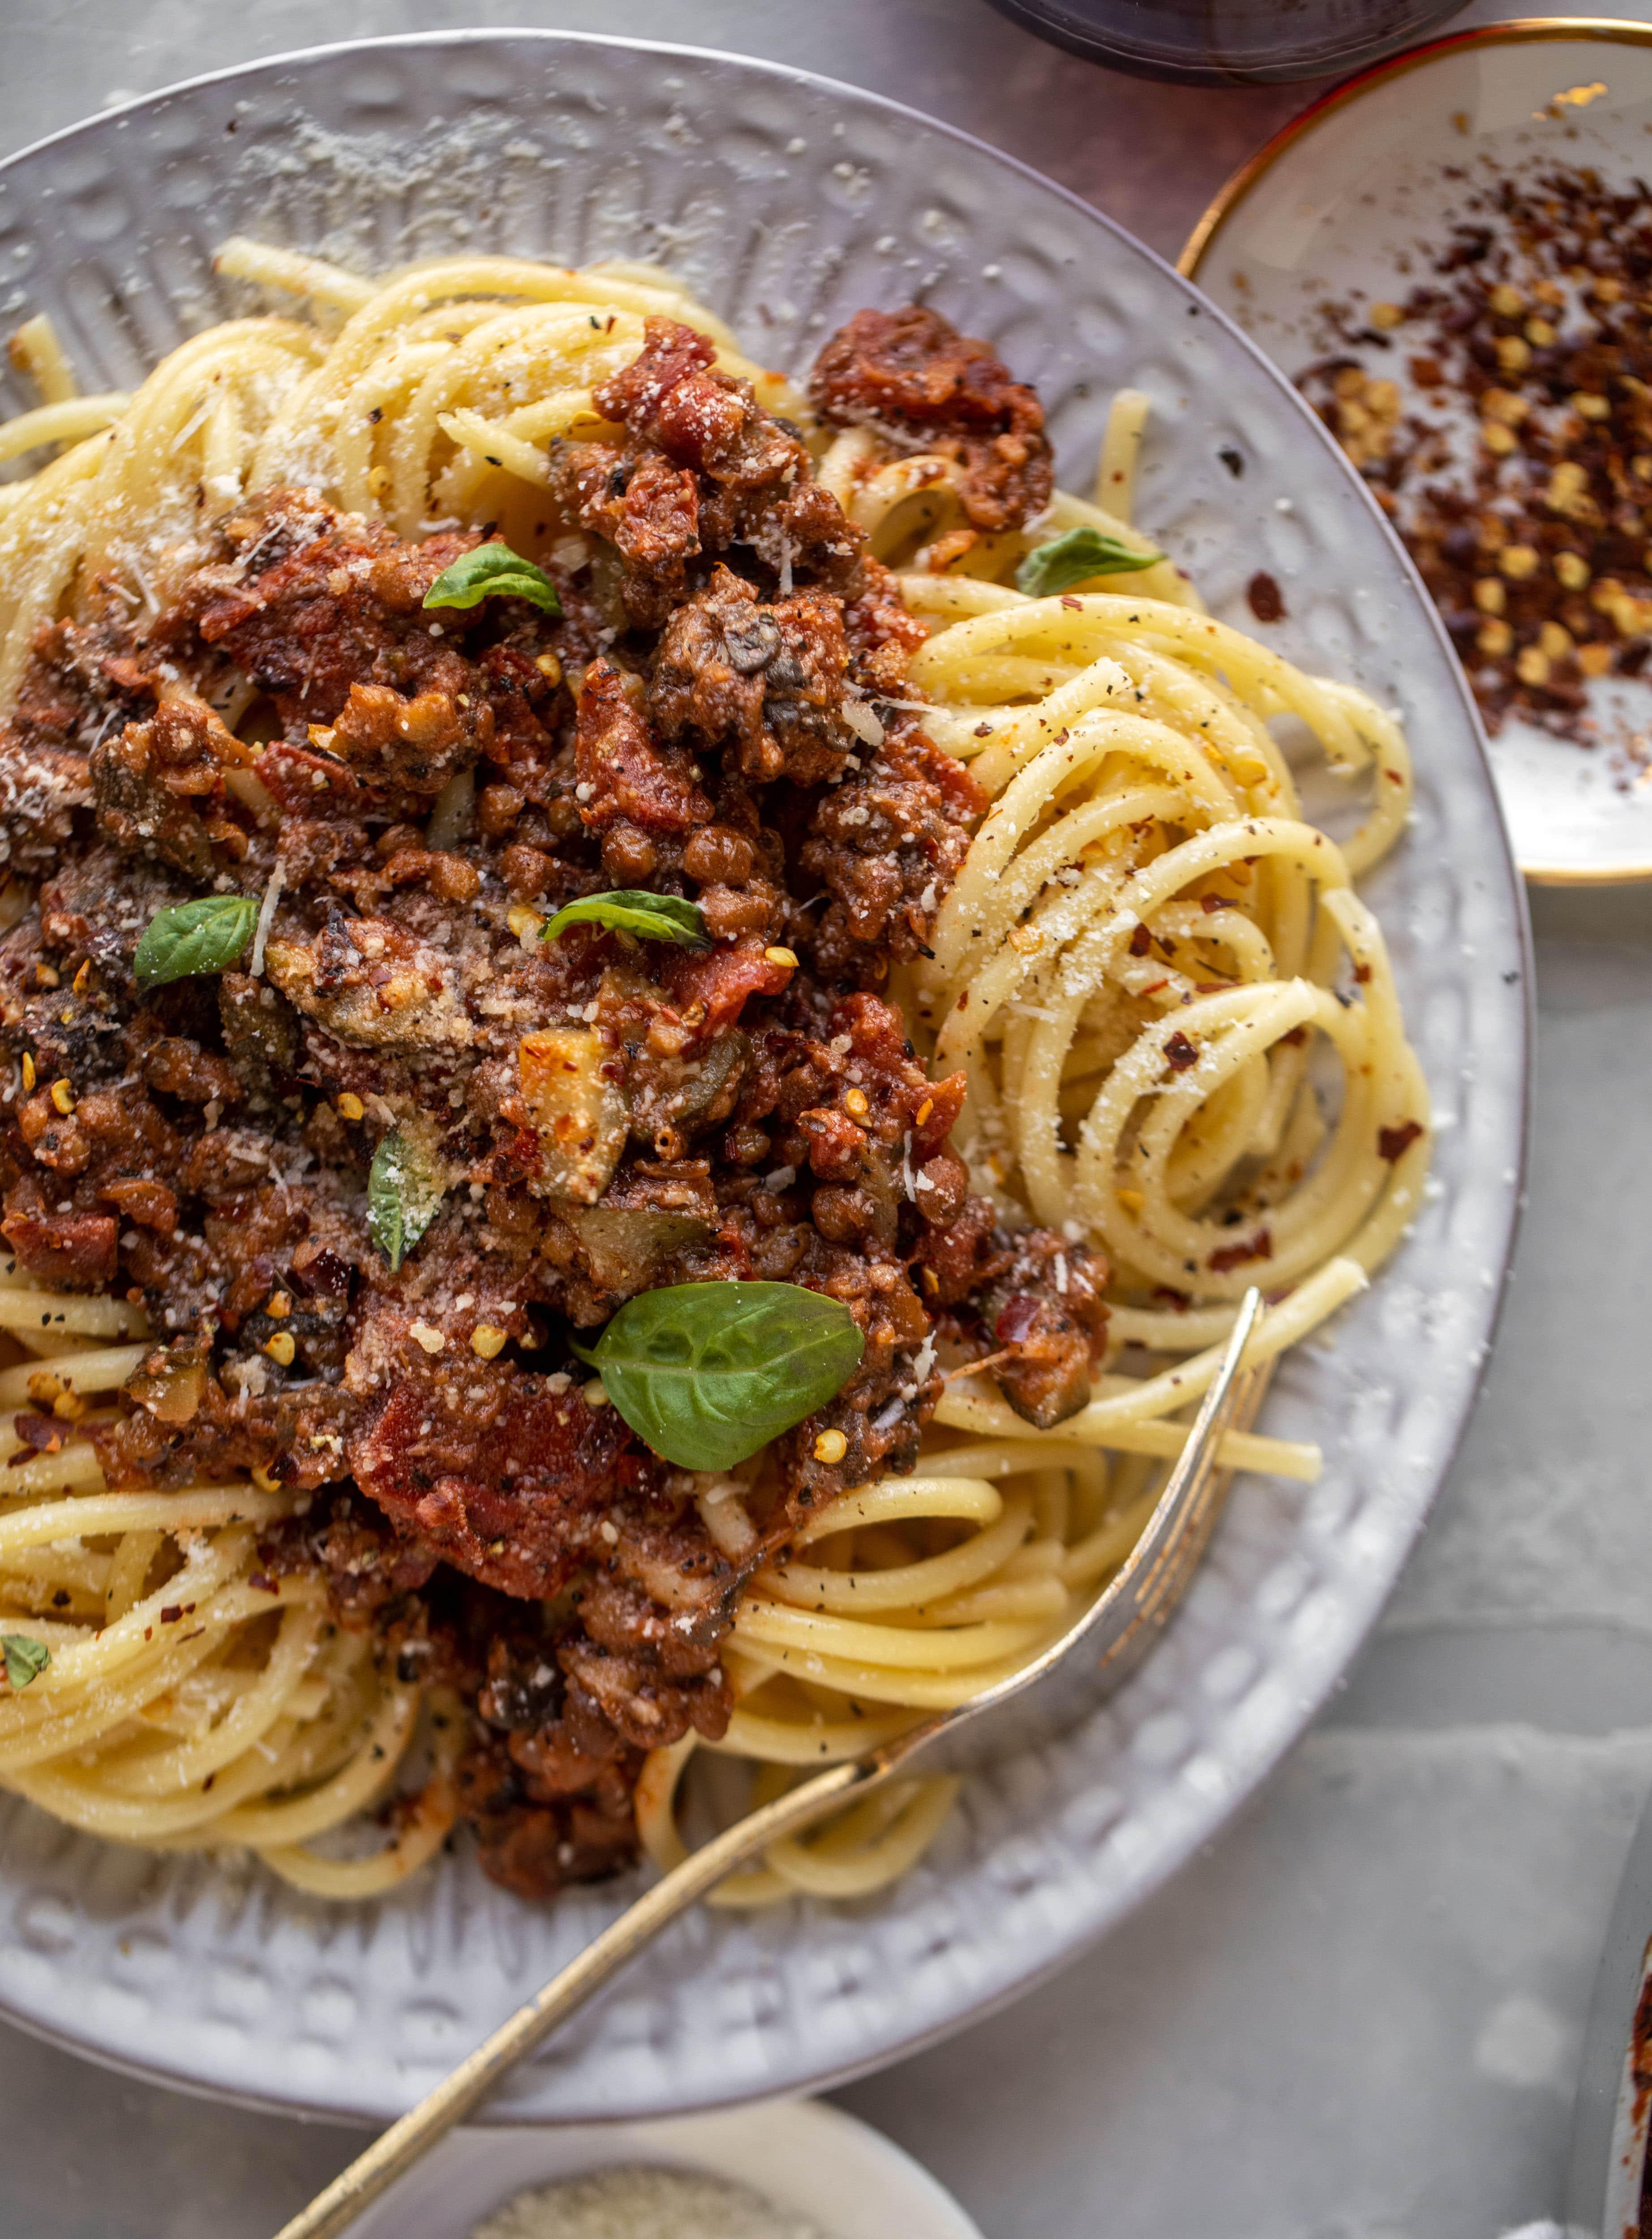 up close lentil bolognese with a fork